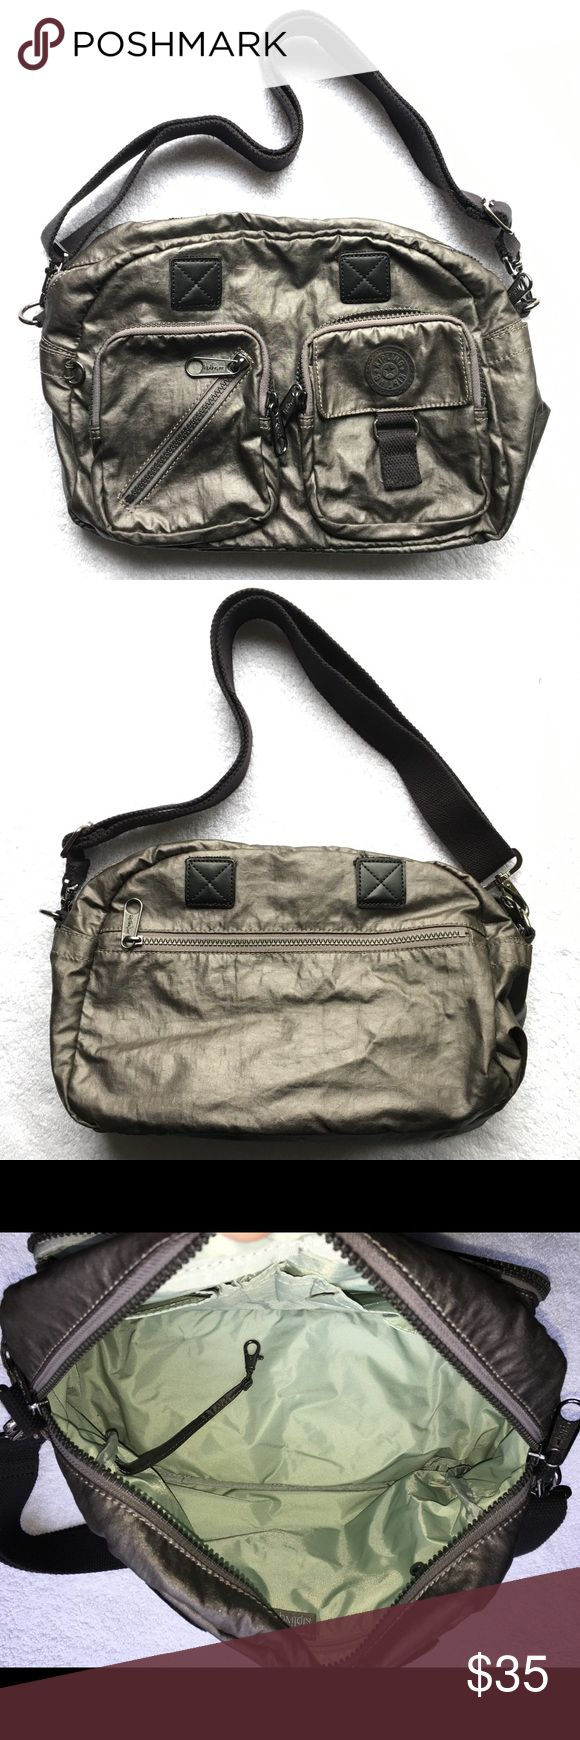 "Kipling Platinum Metallic Satchel Crossbody Bag Utility and Style! Like the popular  ""Defea"" bag  Great, gently used condition Kipling Bags Crossbody Bags"